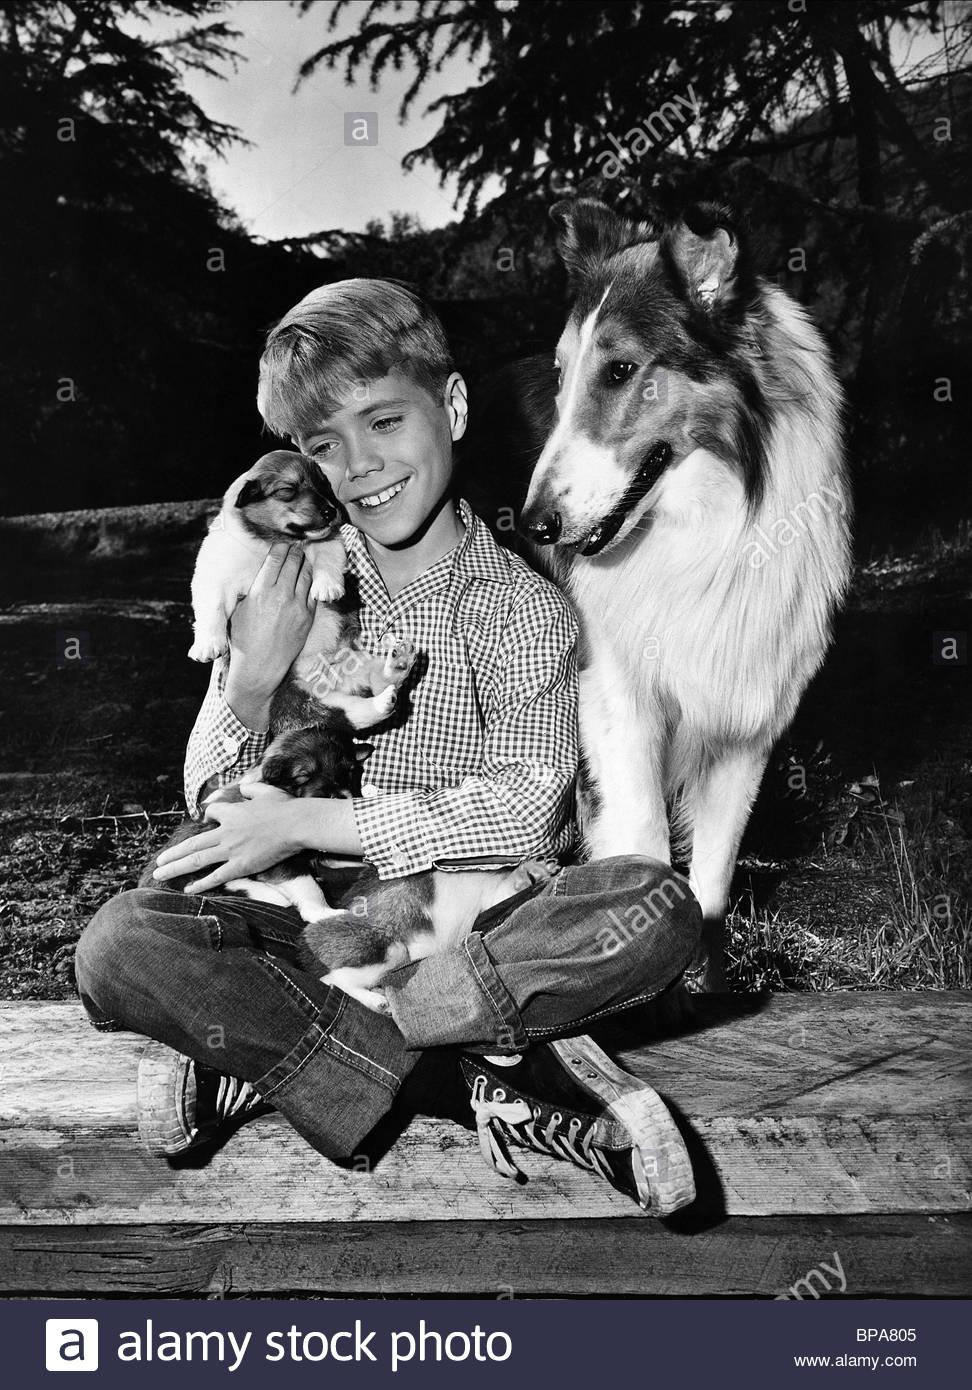 jon-provost-dog-lassie-1954-BPA805